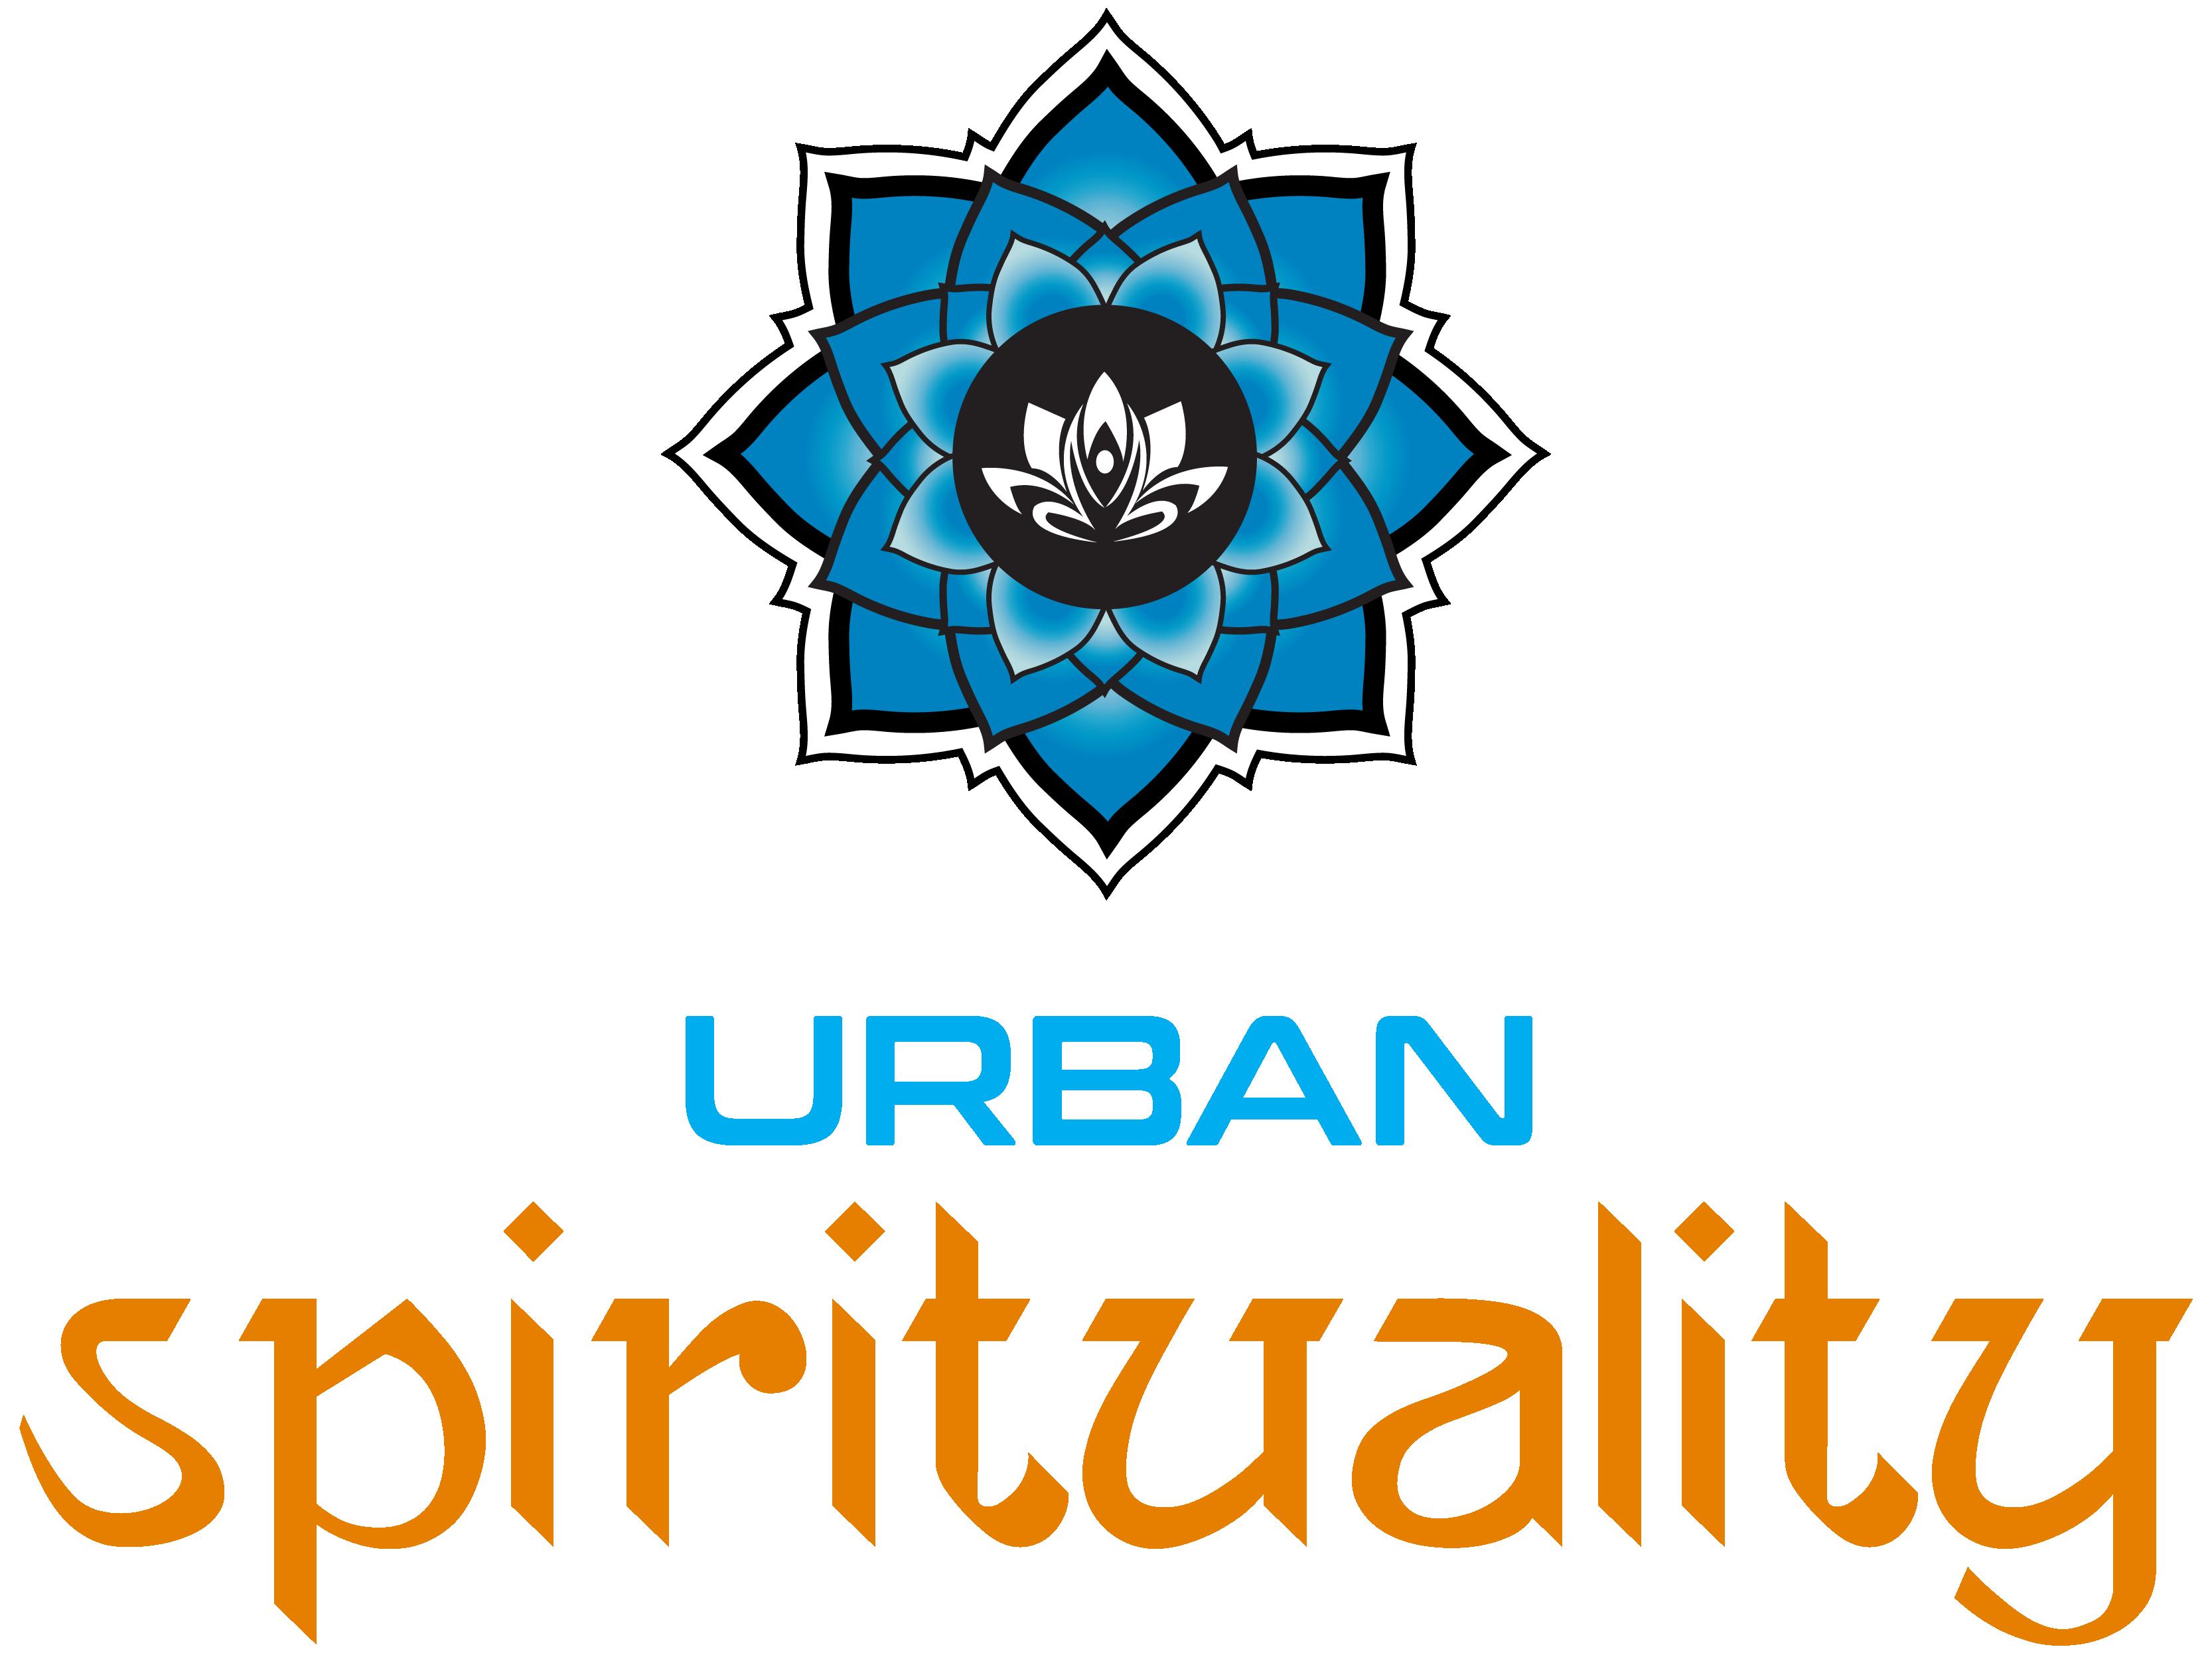 UrbanSpirituality